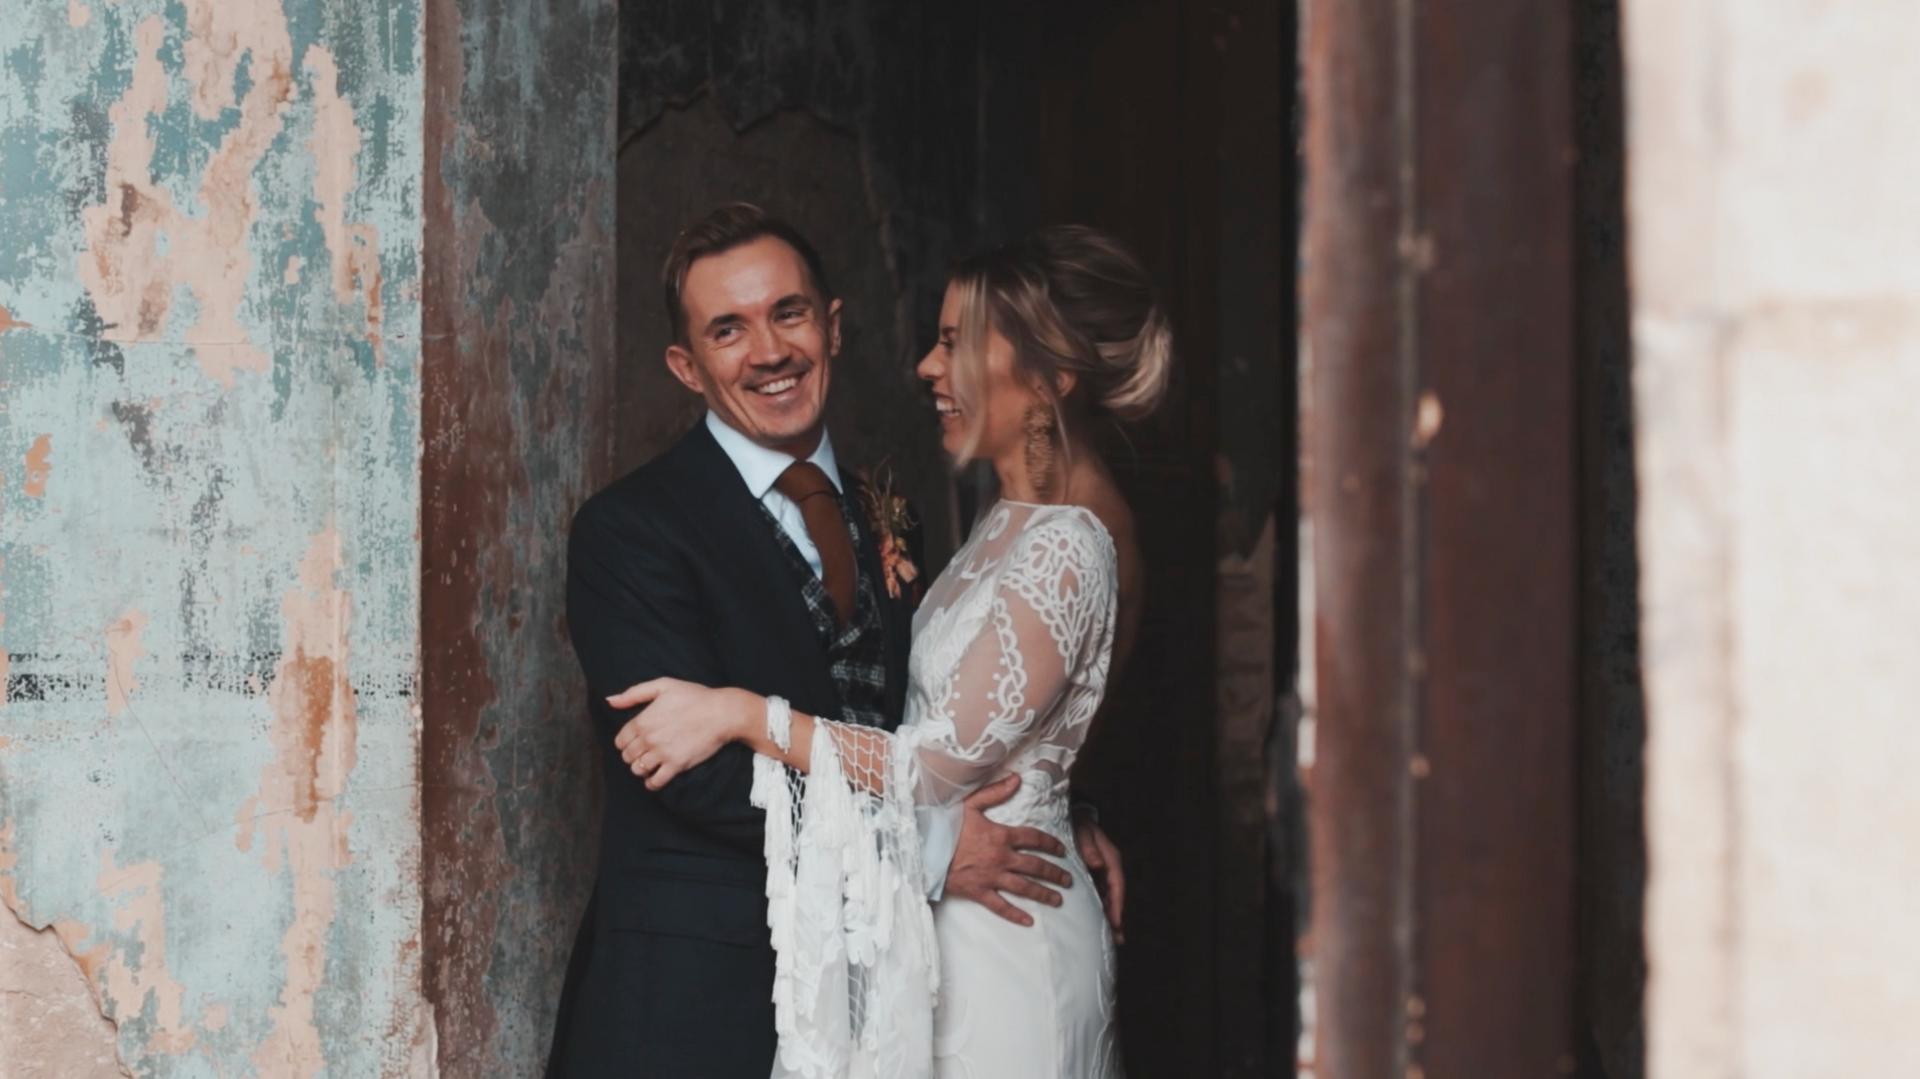 SAM AND CHRIS - LONDON INDUSTRIAL BOHO WEDDING